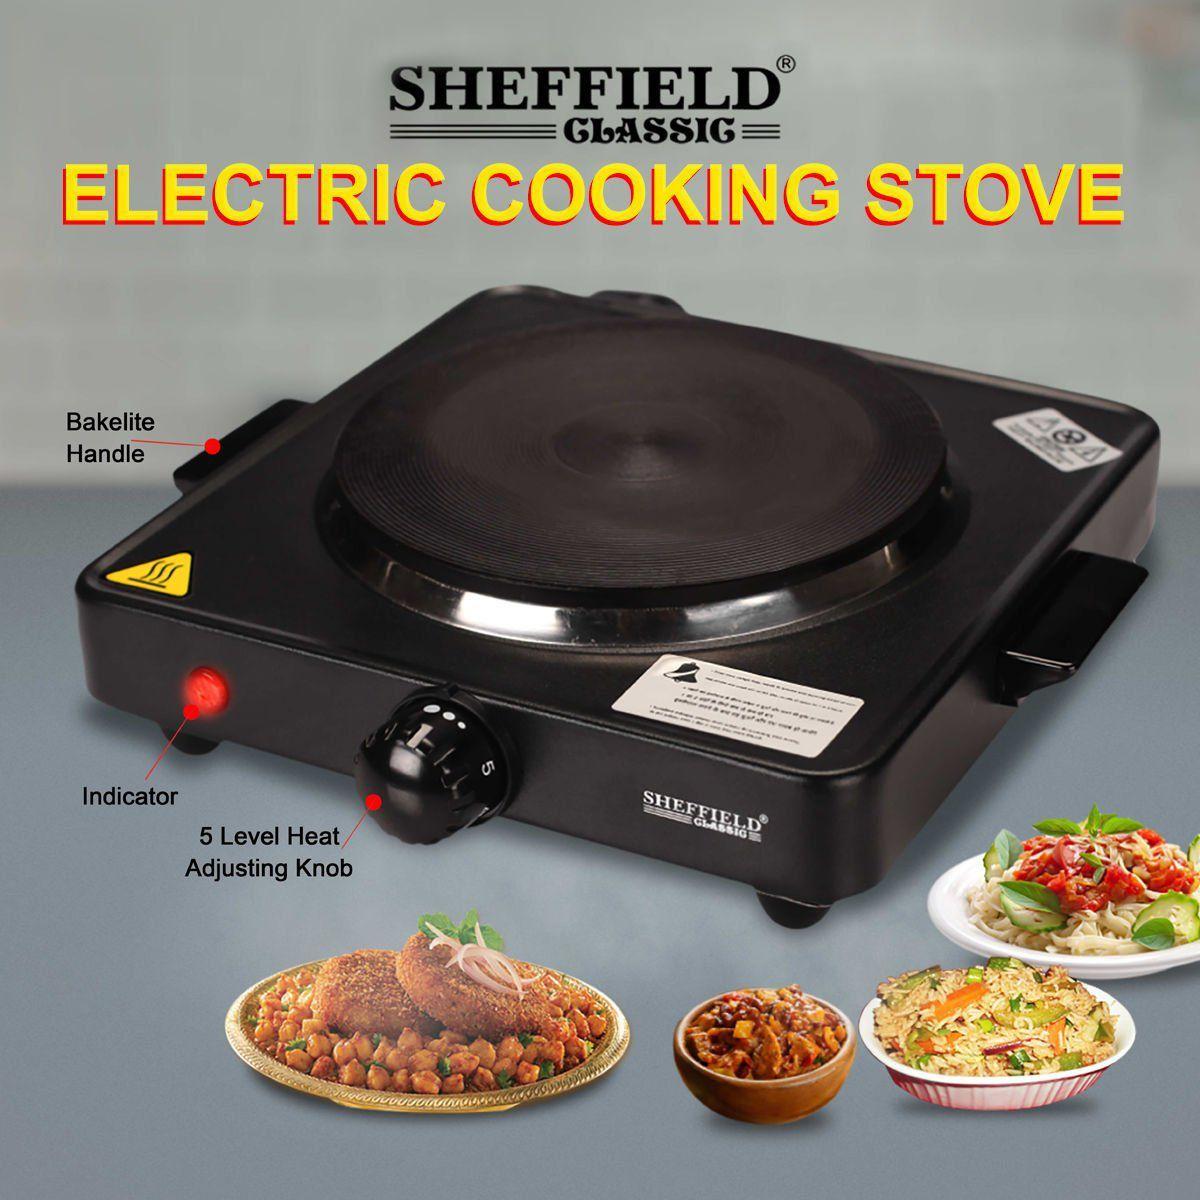 Sheffield Clic 1500 Watt Electric Hot Plate Cook Top